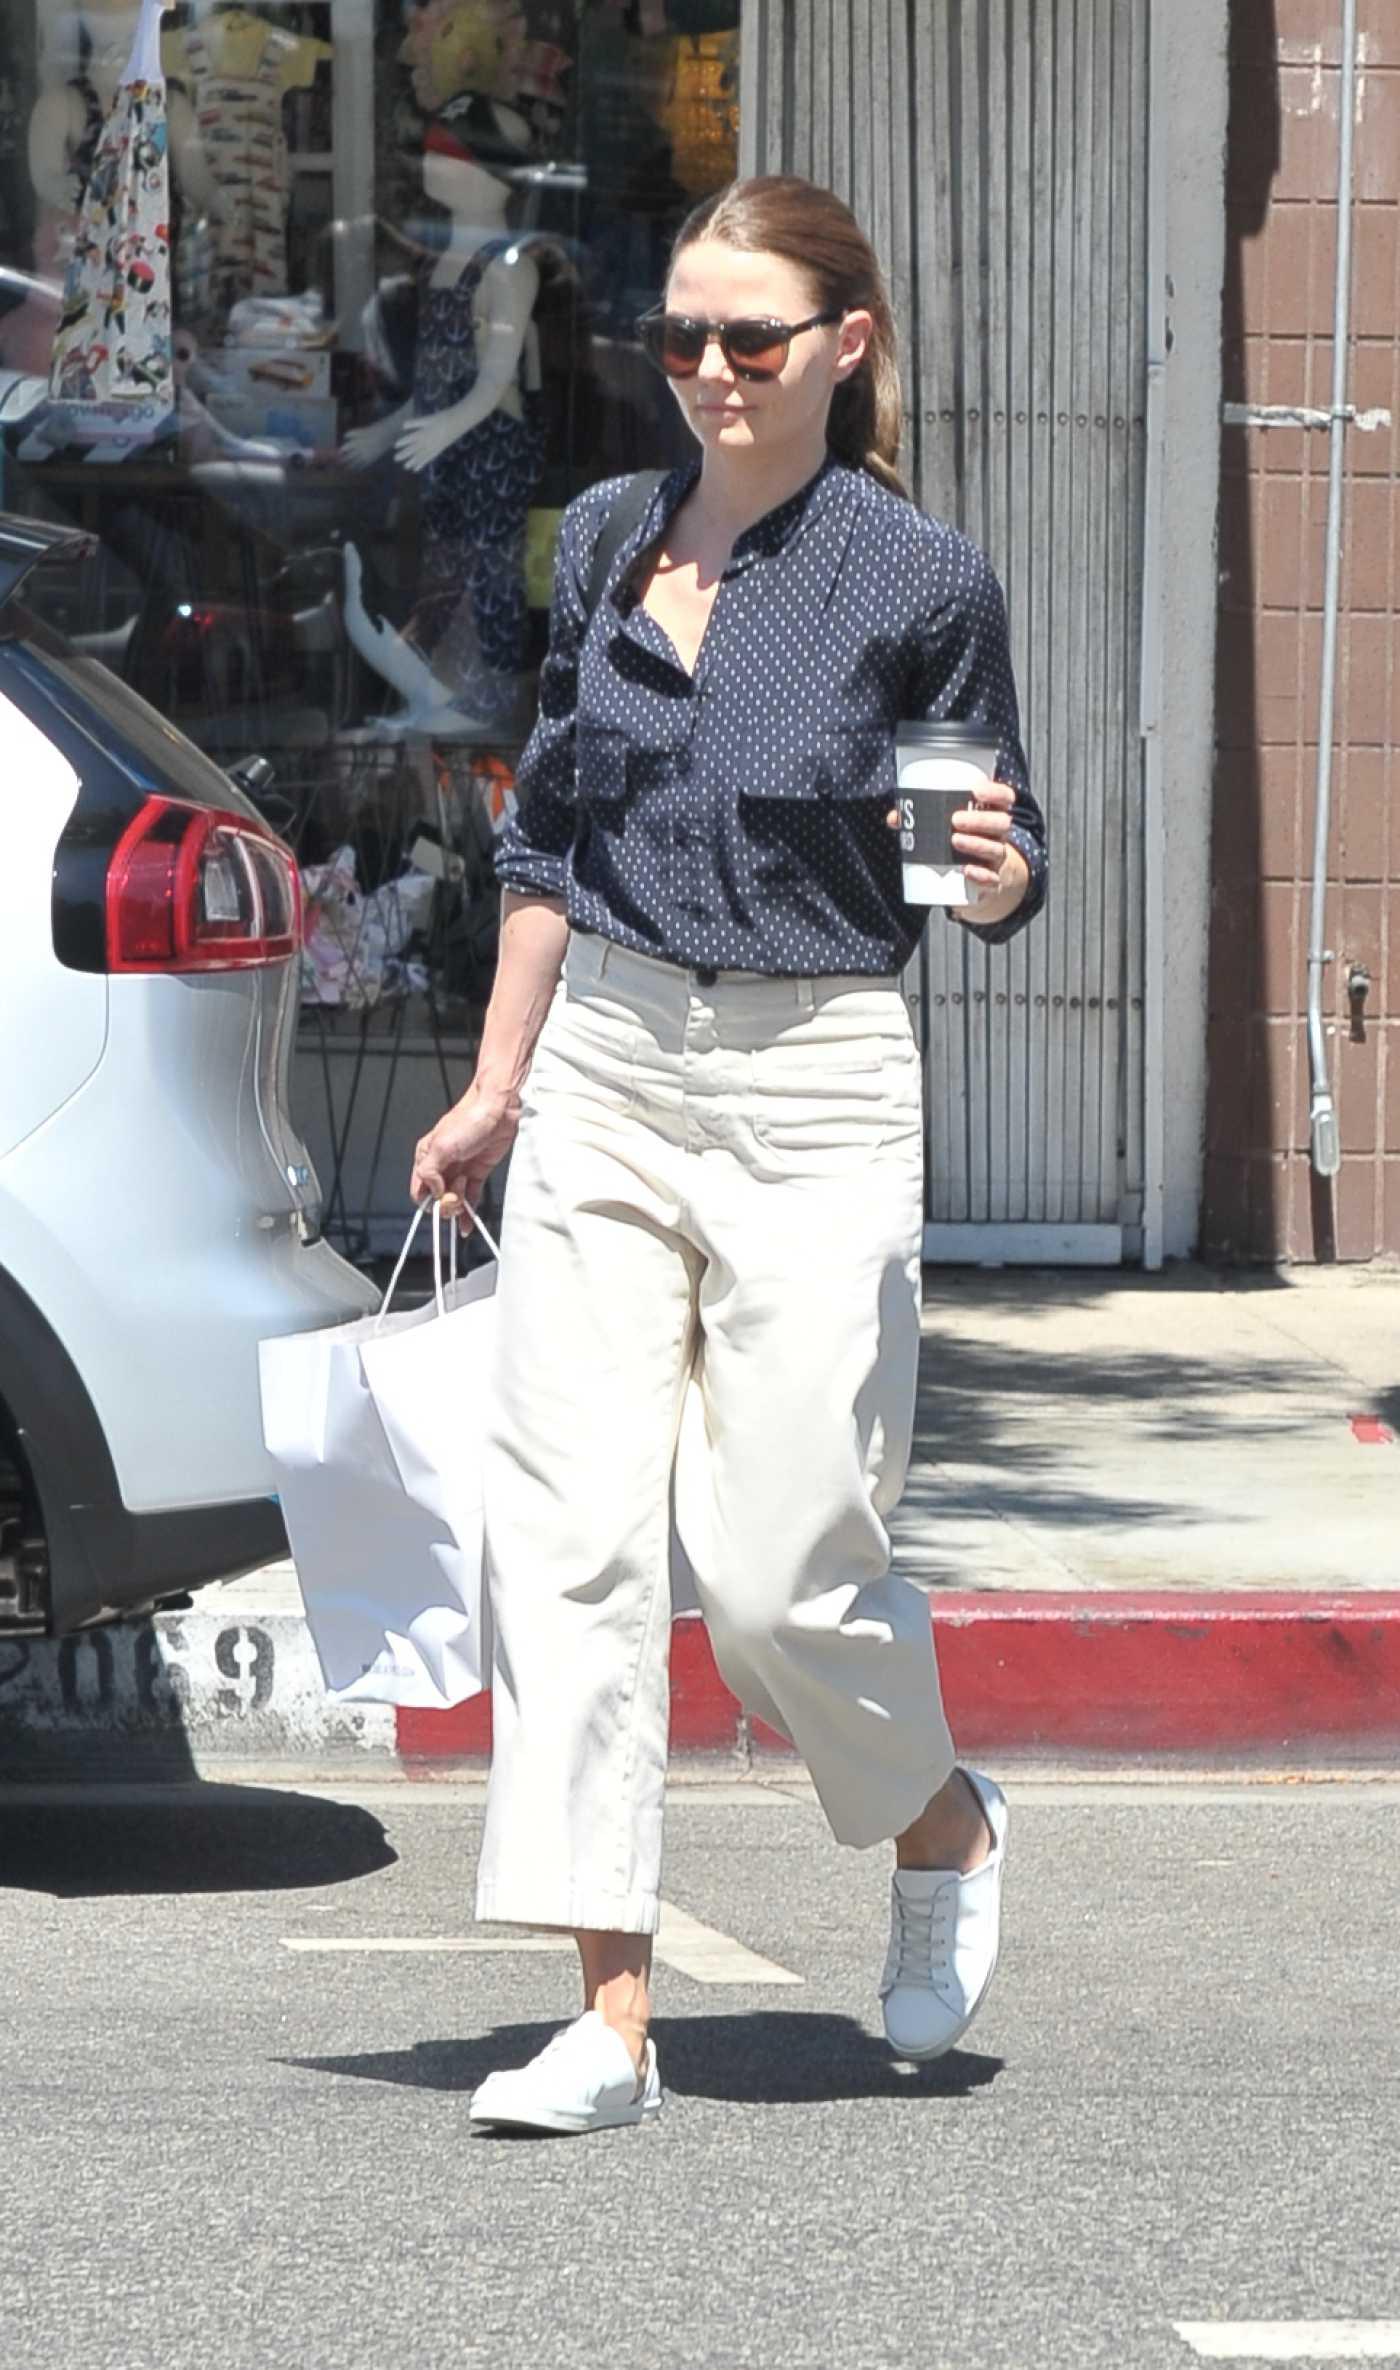 Jennifer Morrison in a White Sneakers Was Seen Out in Studio City 08/21/2019